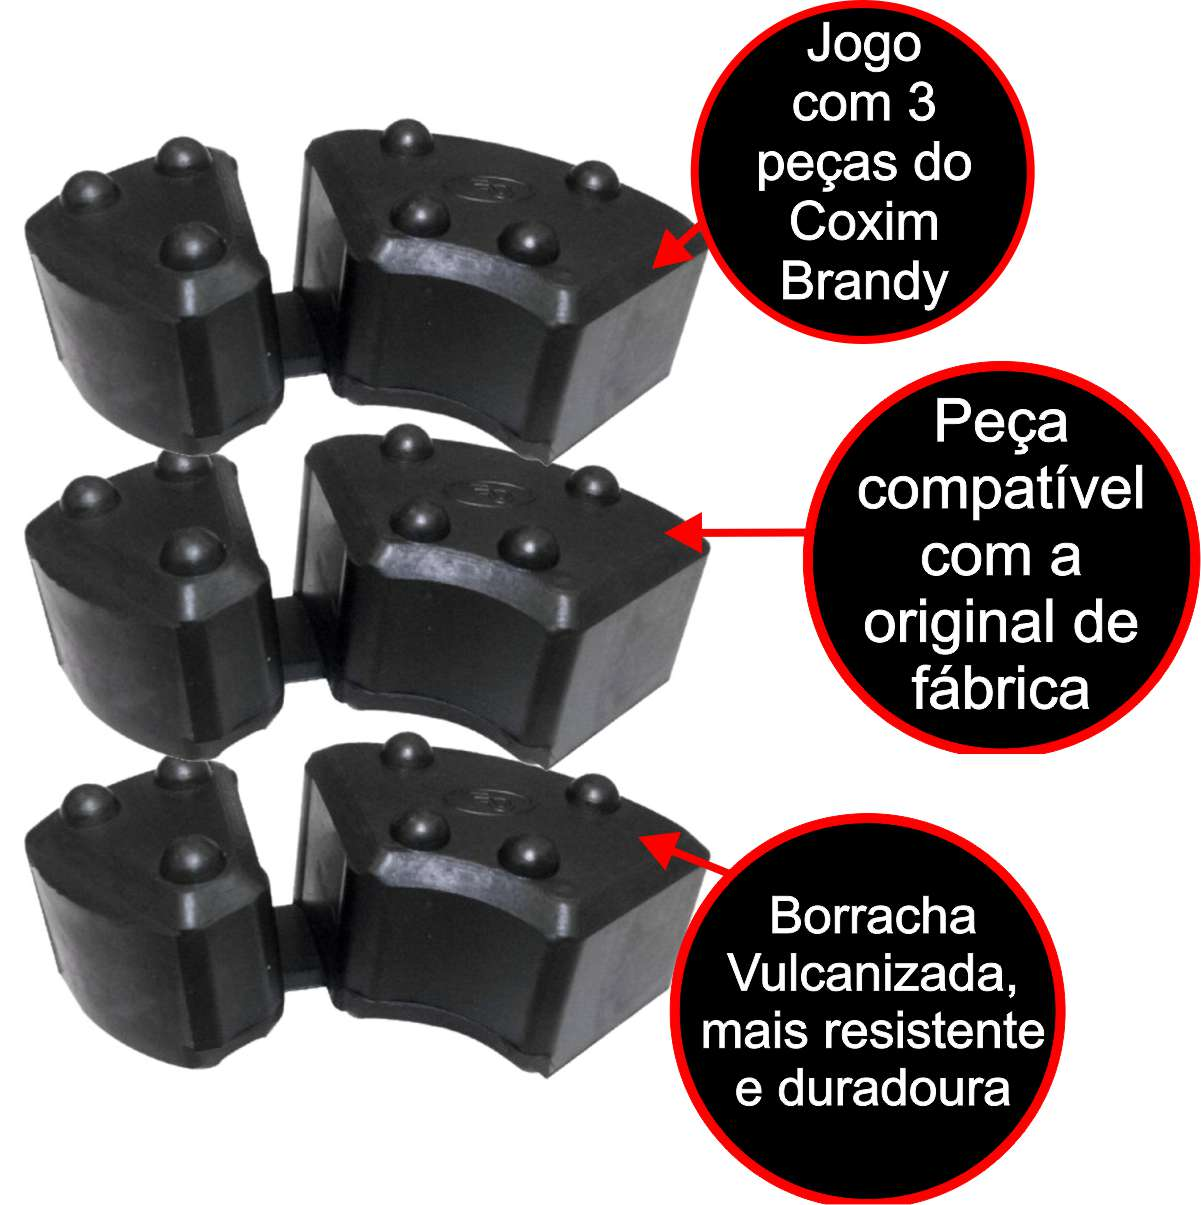 KIT COXIM BORRACHA BUCHA COROA RODA BMW F650 GS até 2007 / G650 GS JOGO 3 PEÇAS + GRAXA SPRAY 60ml